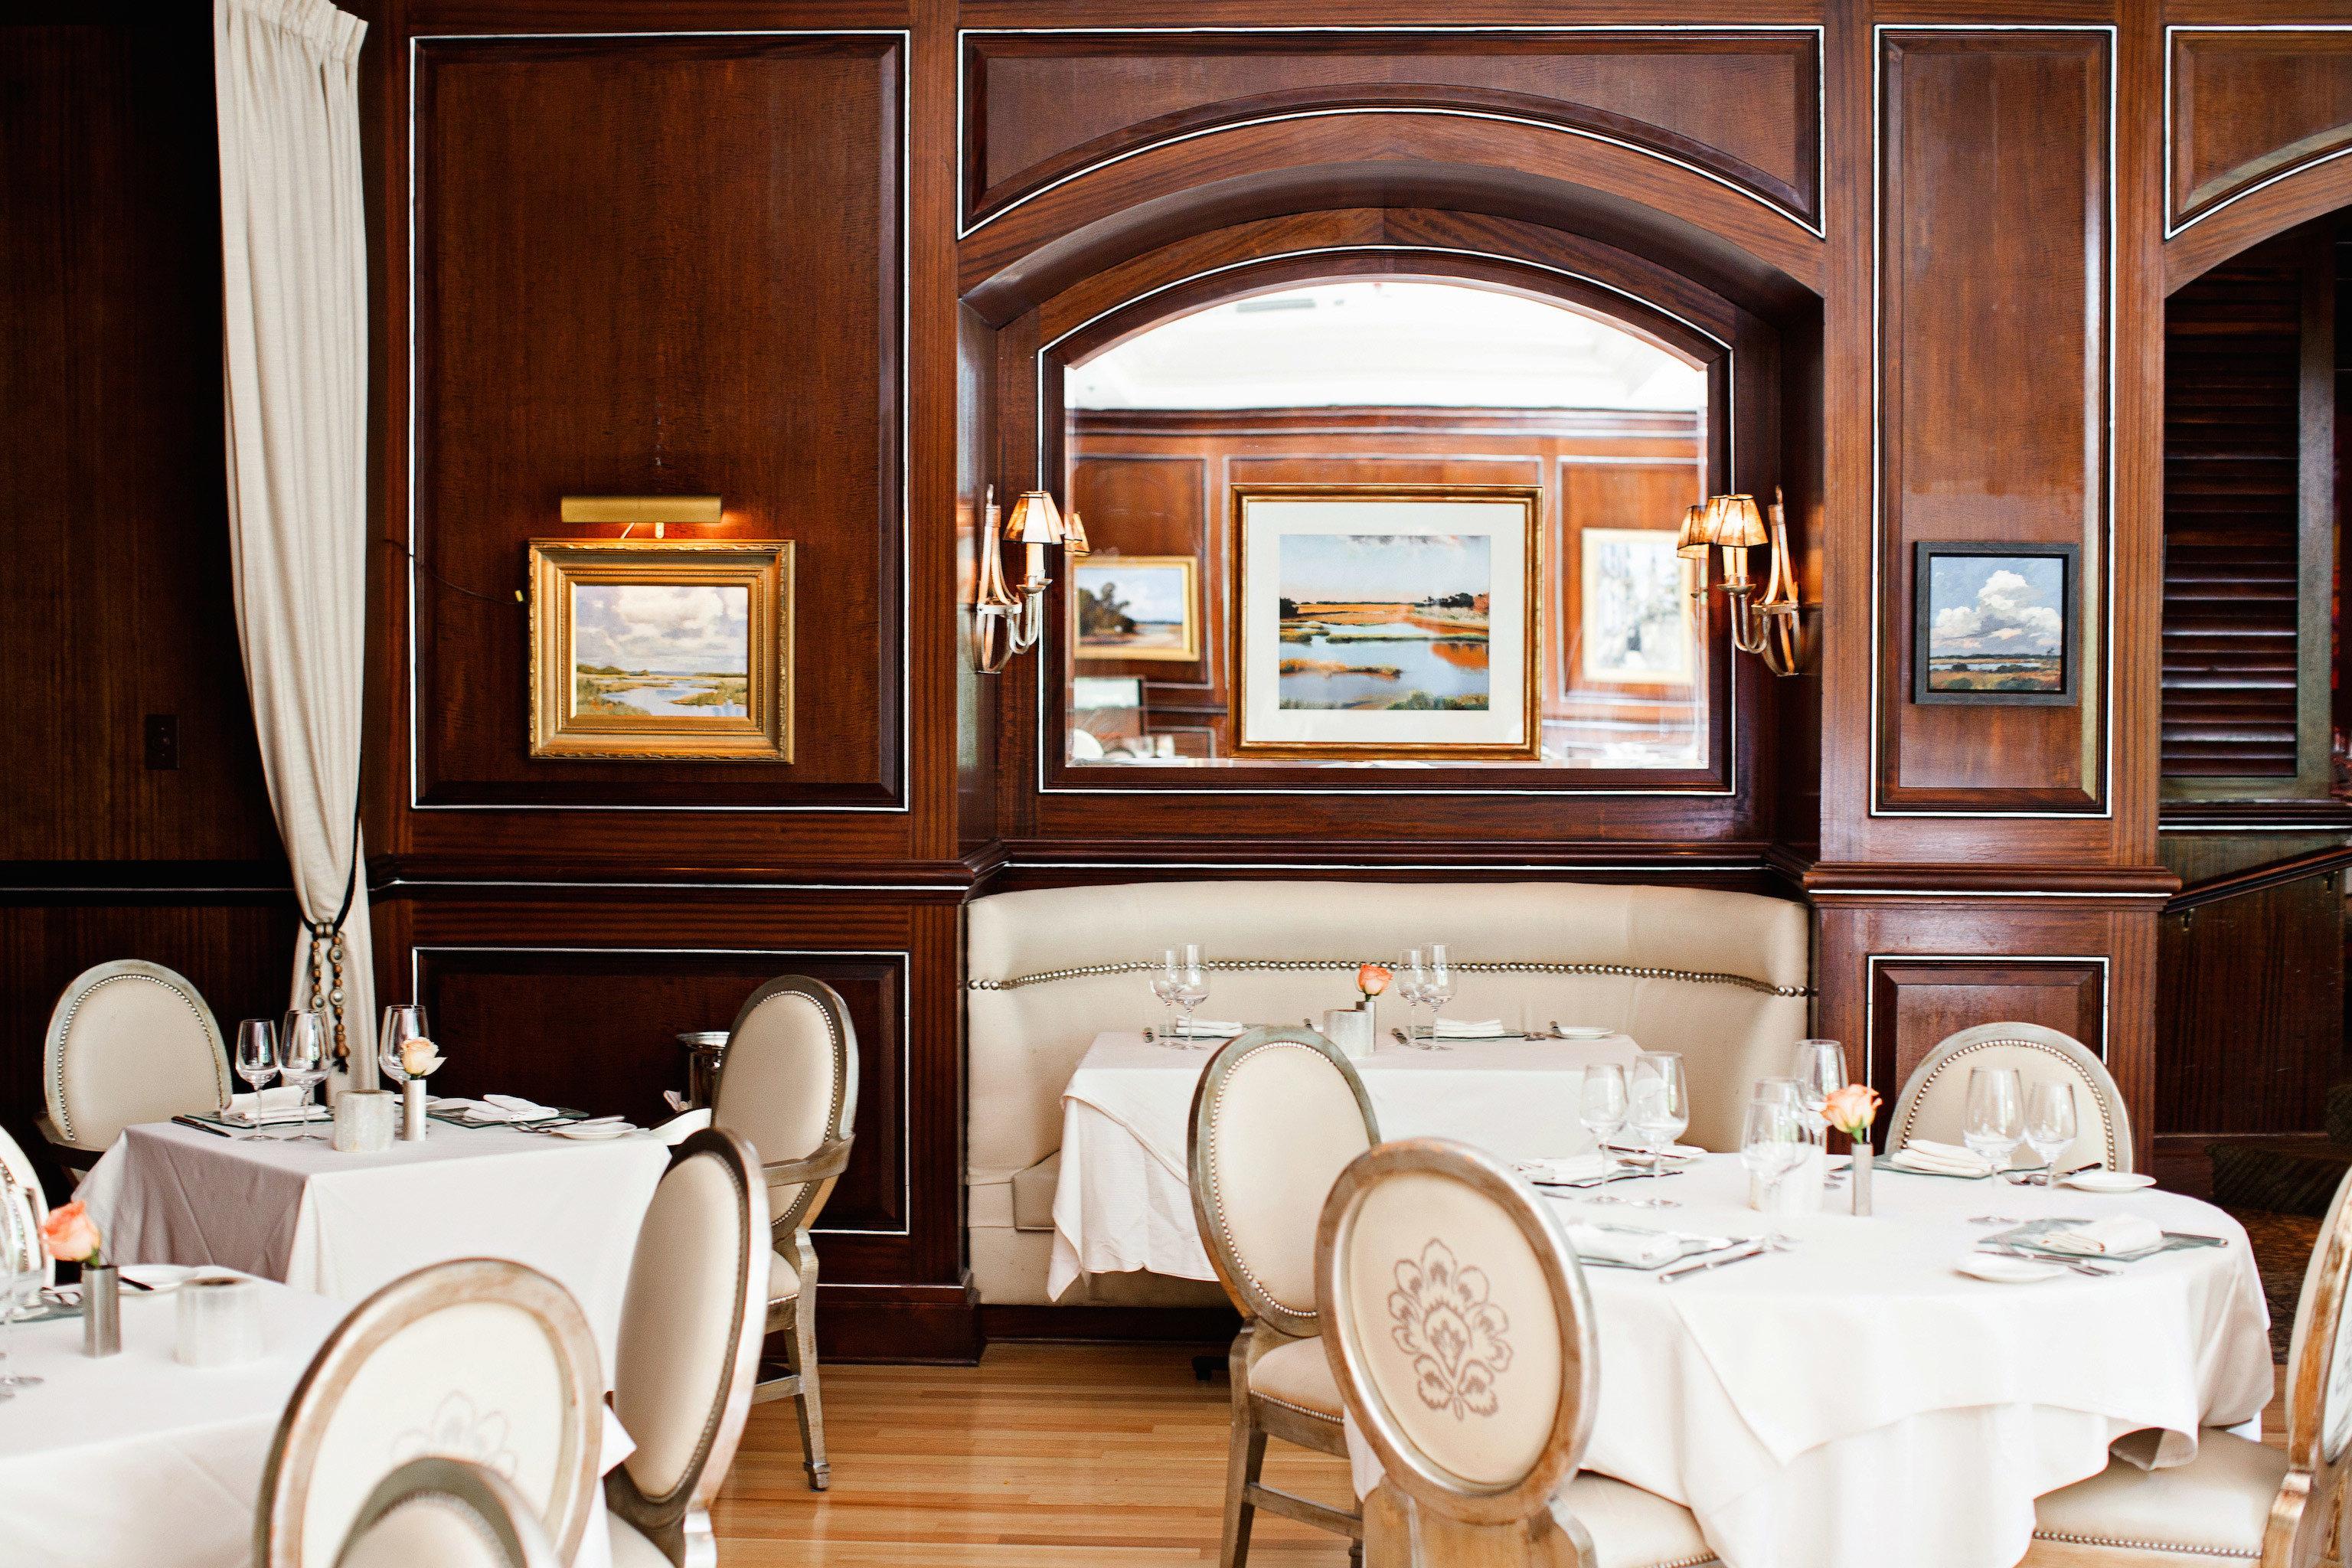 City Classic Cultural Dining Drink Eat Elegant Historic home Suite living room restaurant